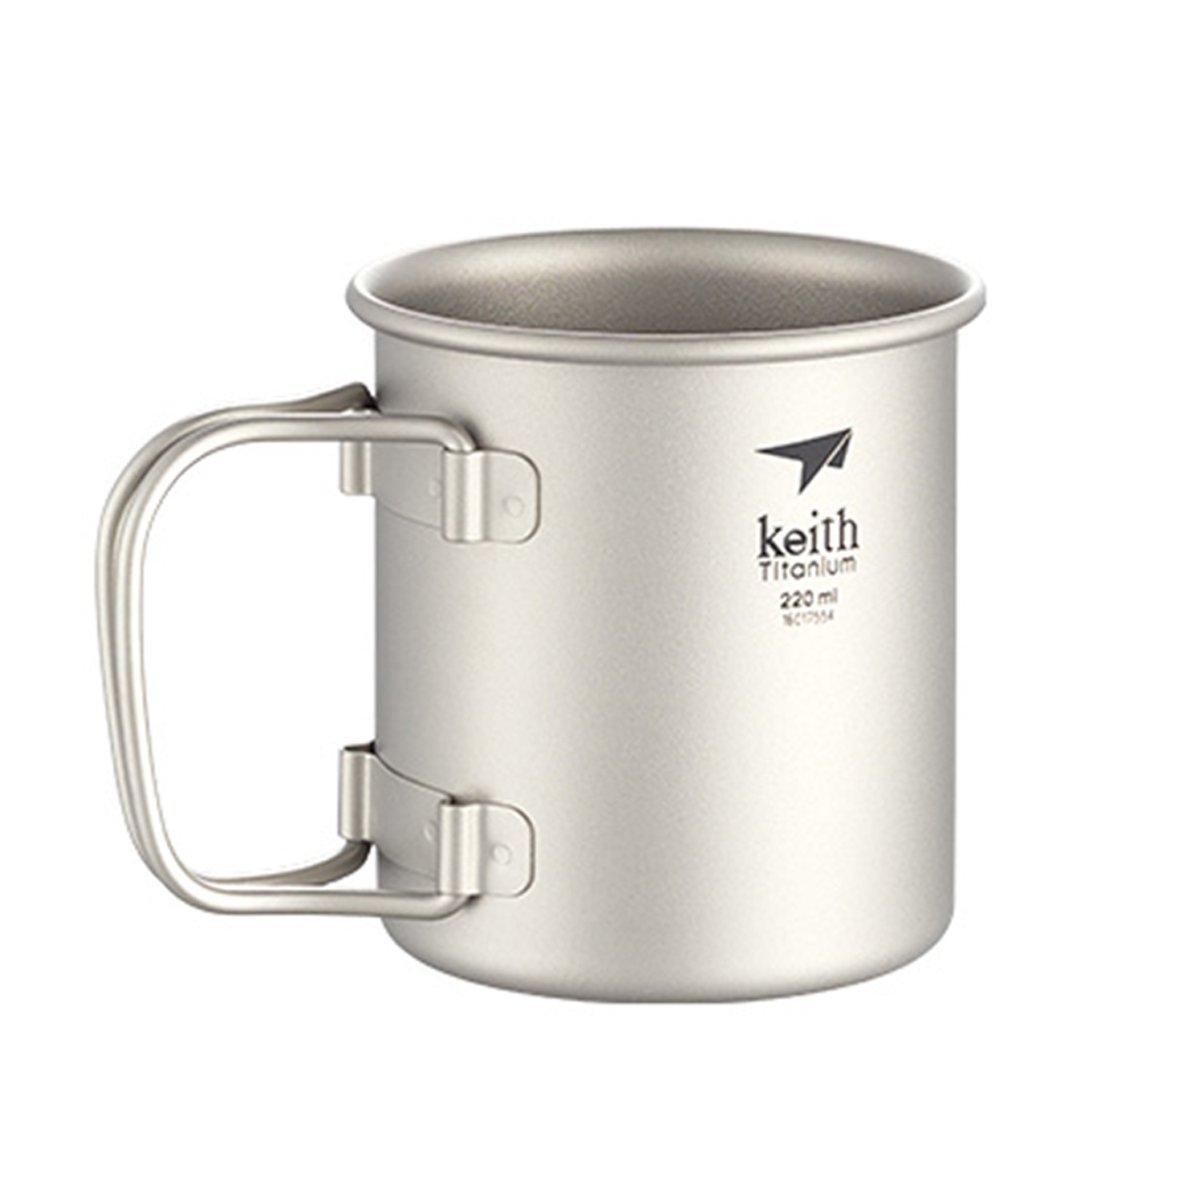 Keithチタンti3203 single-wall Mug with Foldingハンドルと蓋 – 13.5 FL OZ   B01IT1NIPA